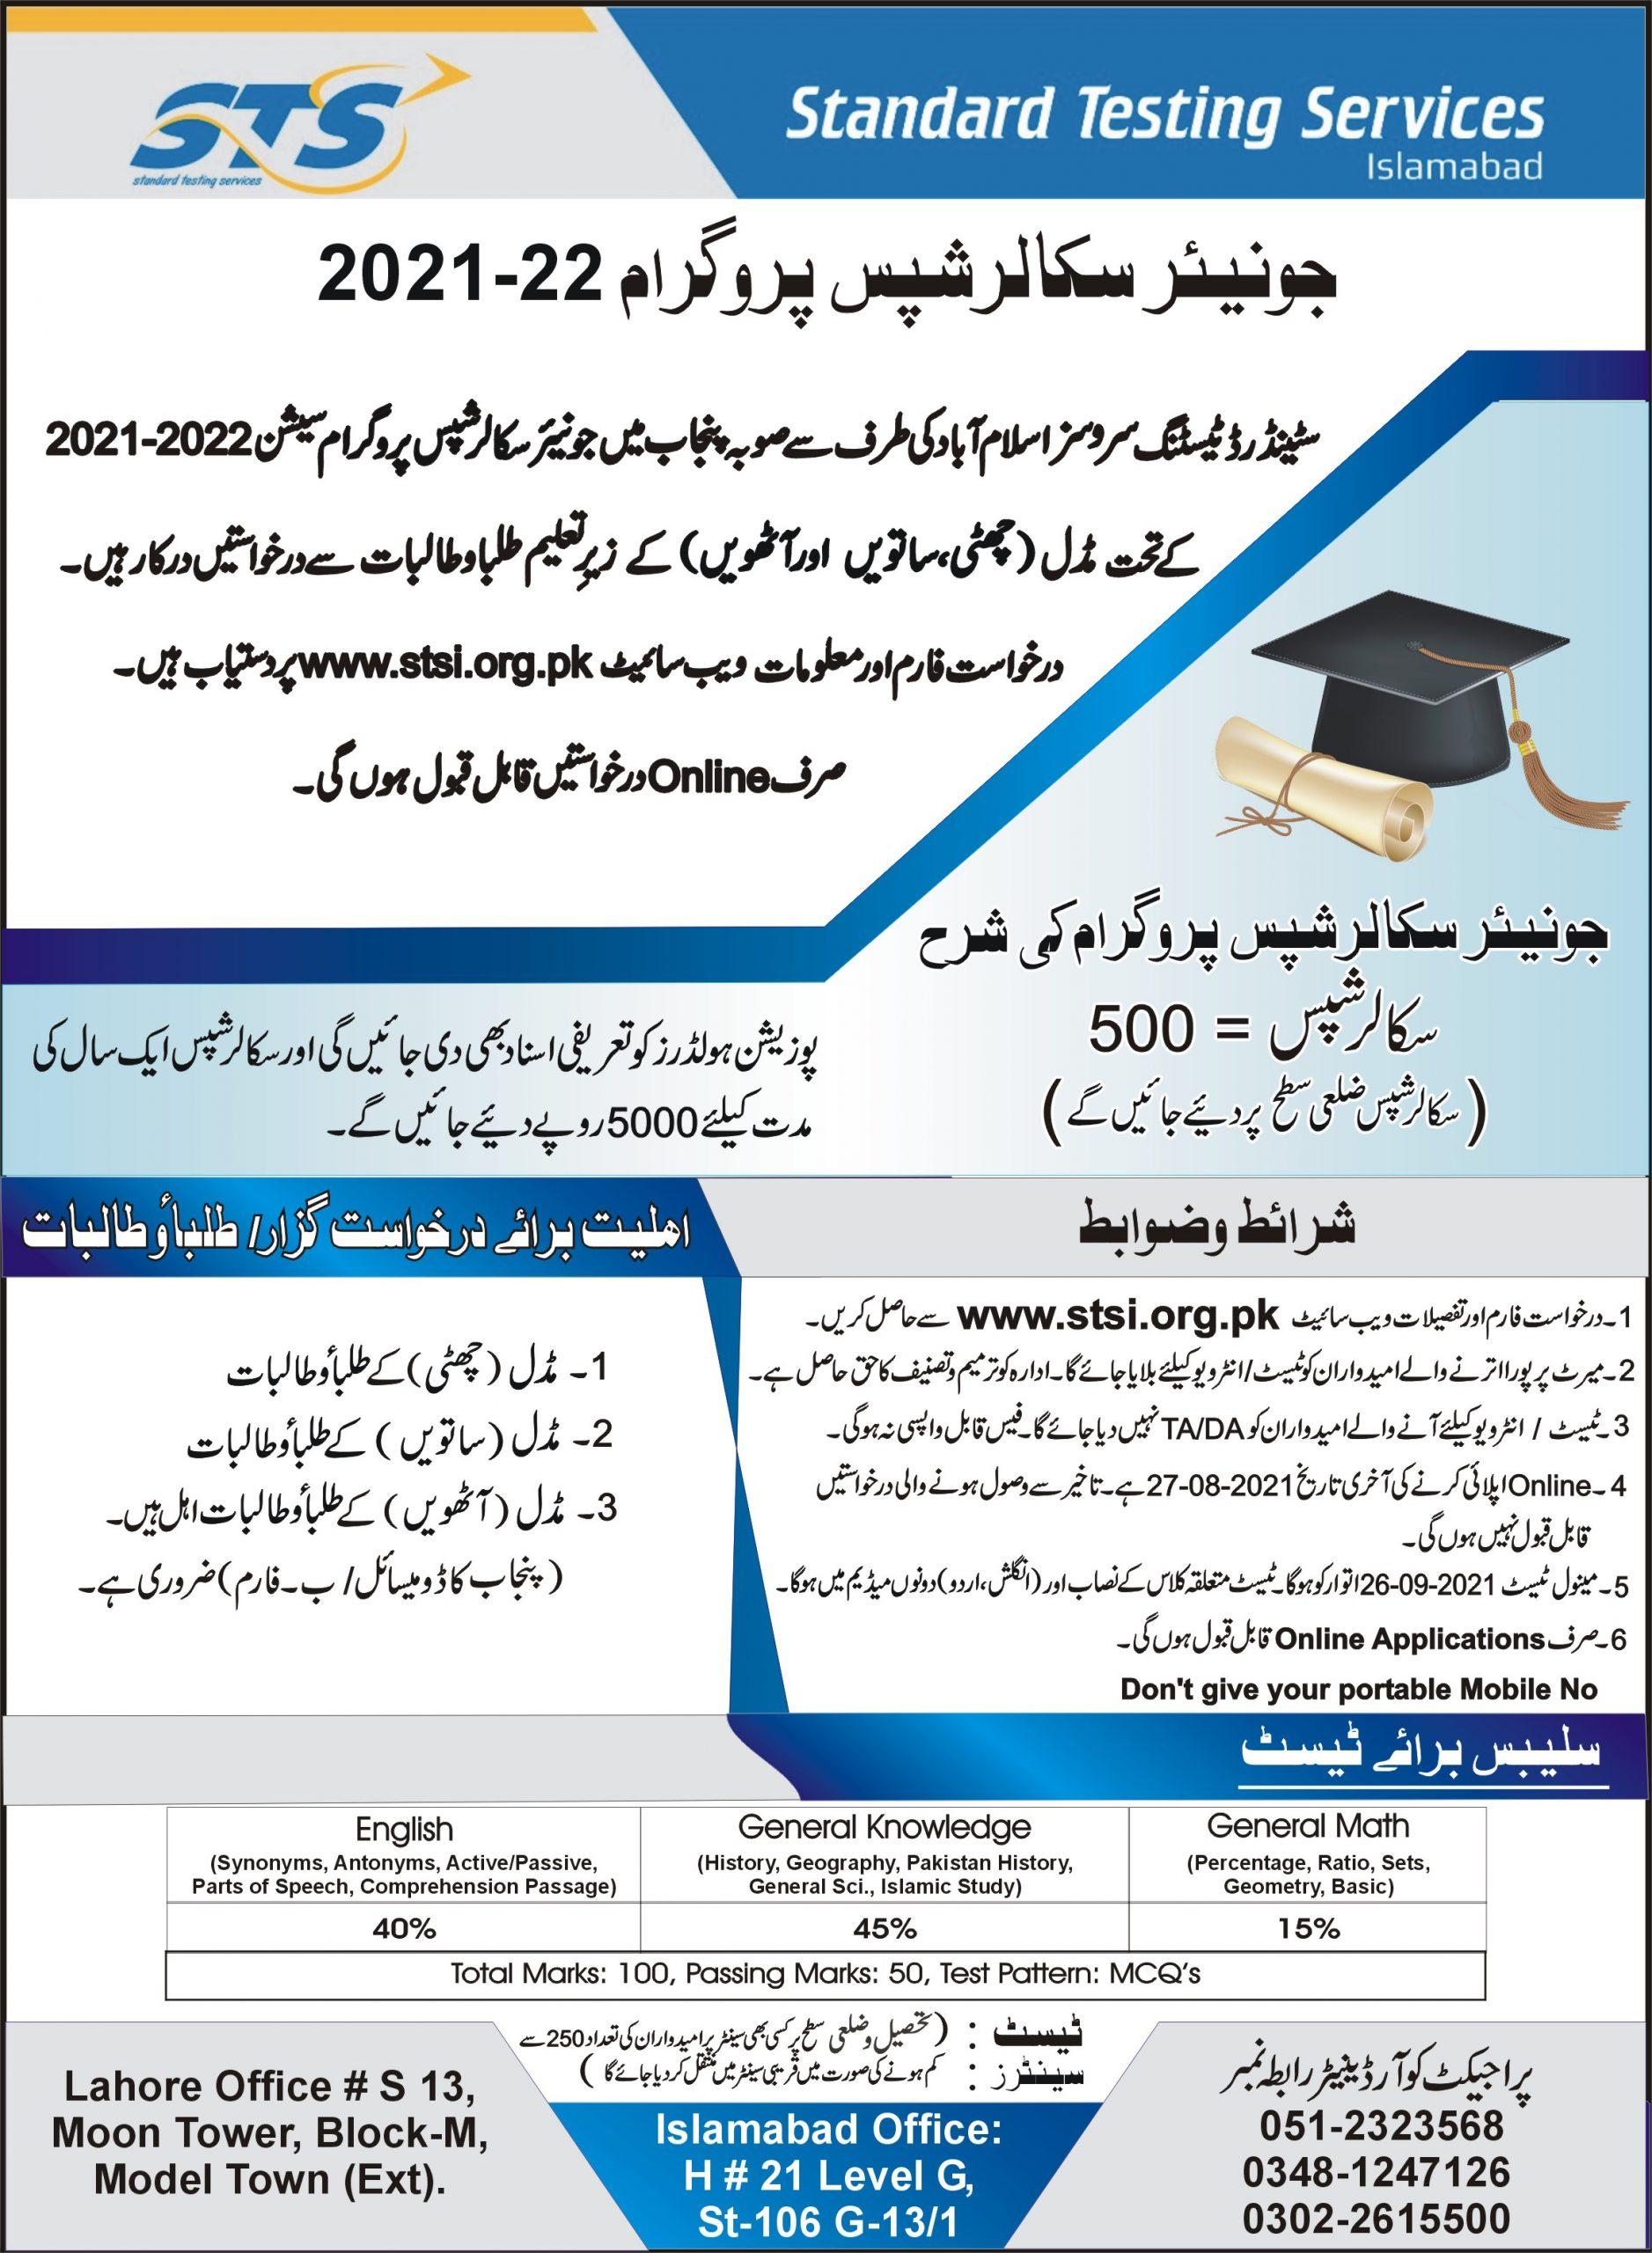 Junior Scholarship Program Phase I Session 2021 2022 STS Roll No Slip